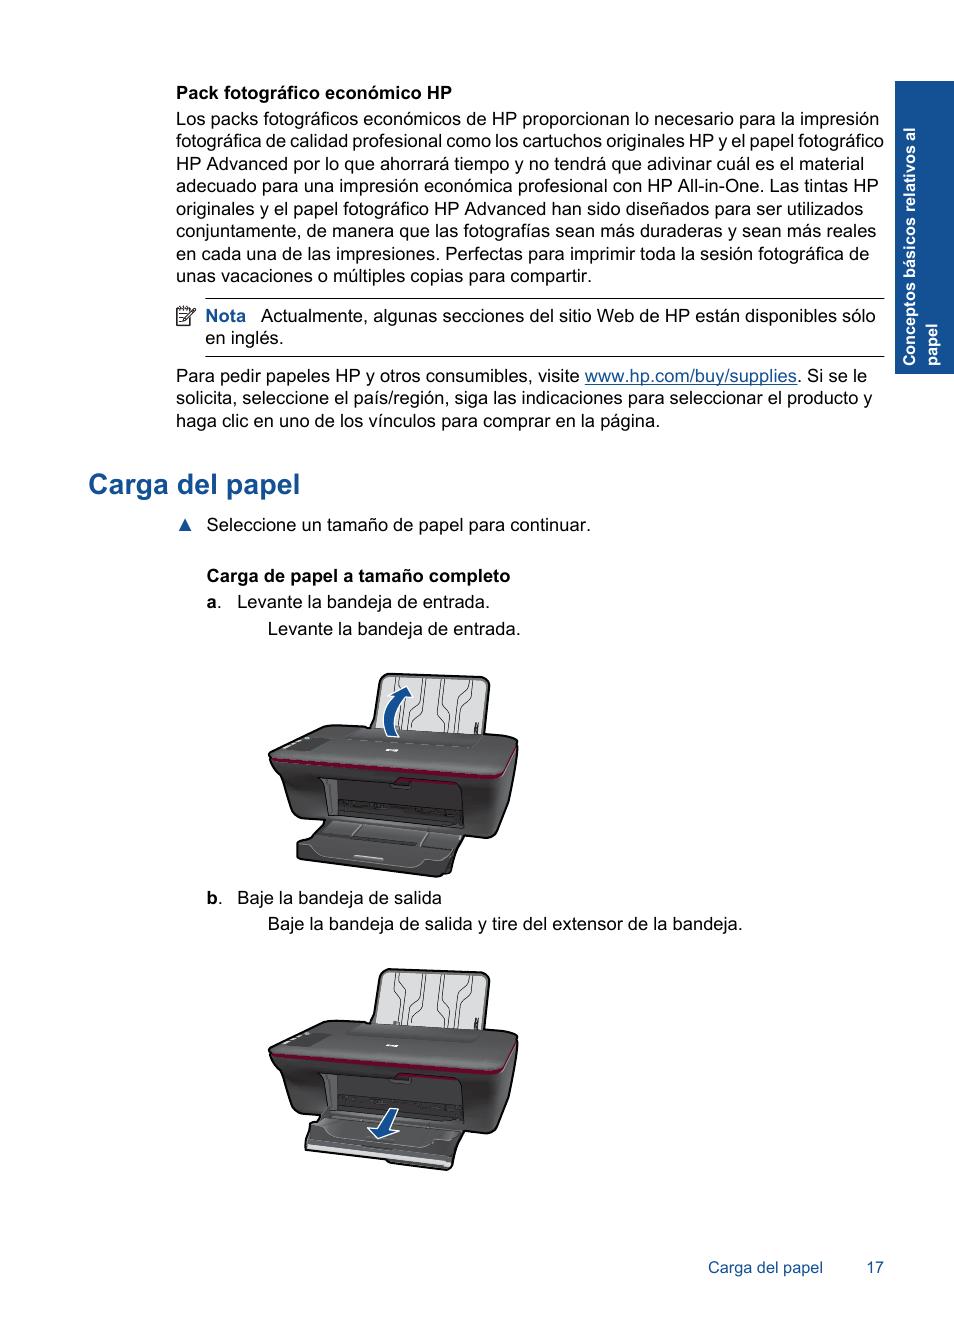 ... Array - carga del papel hp impresora todo en uno hp deskjet 1050 j410a  rh pdfmanuales